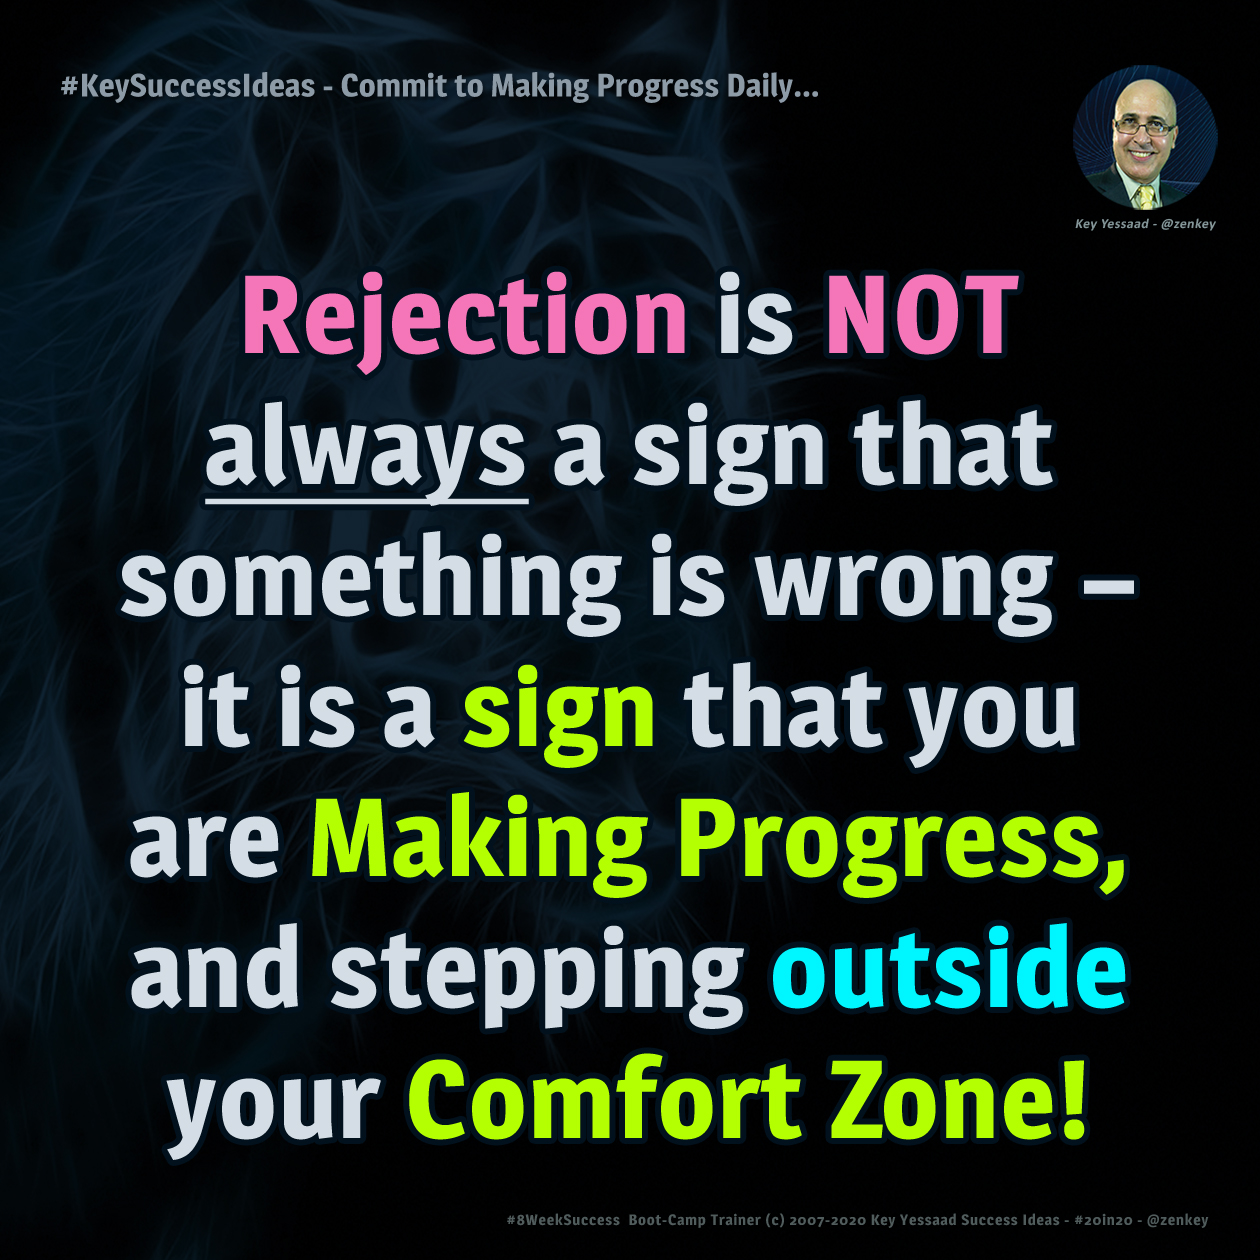 Commit to Making Progress Daily... - #KeySuccessIdeas